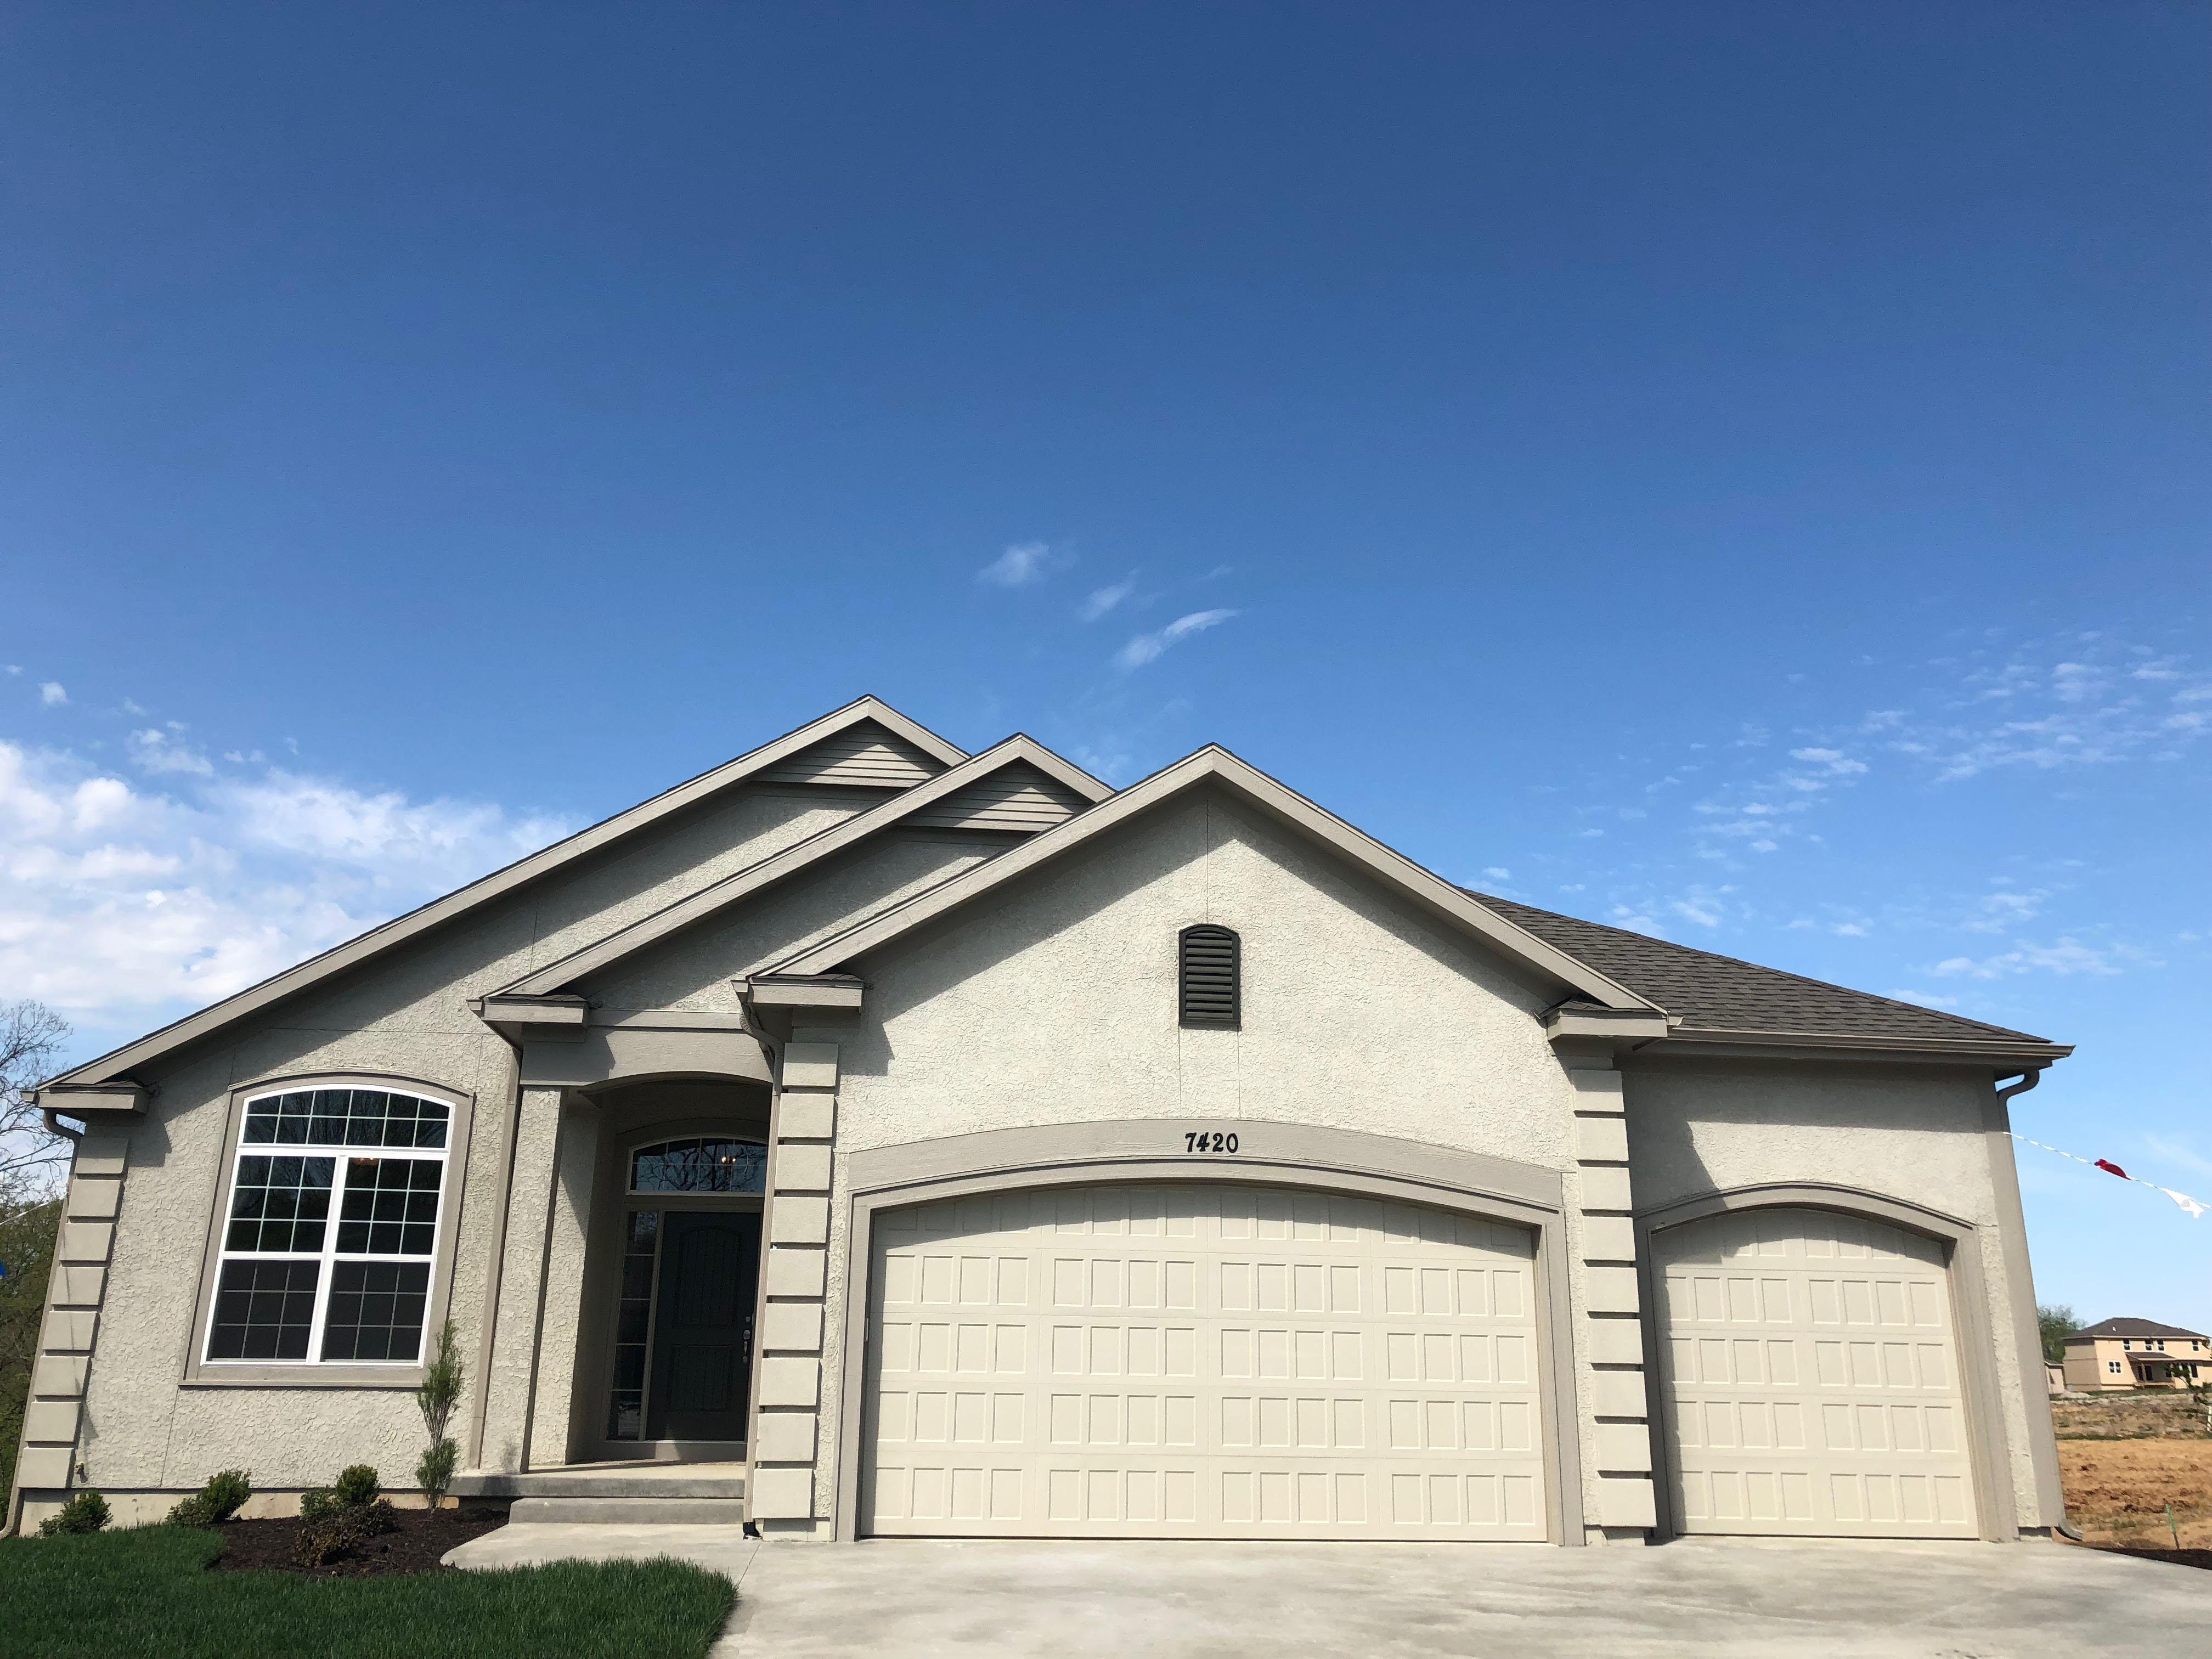 4 FRISBIE CARTER CUSTOM HOMES Communities in Kansas City, MO ...